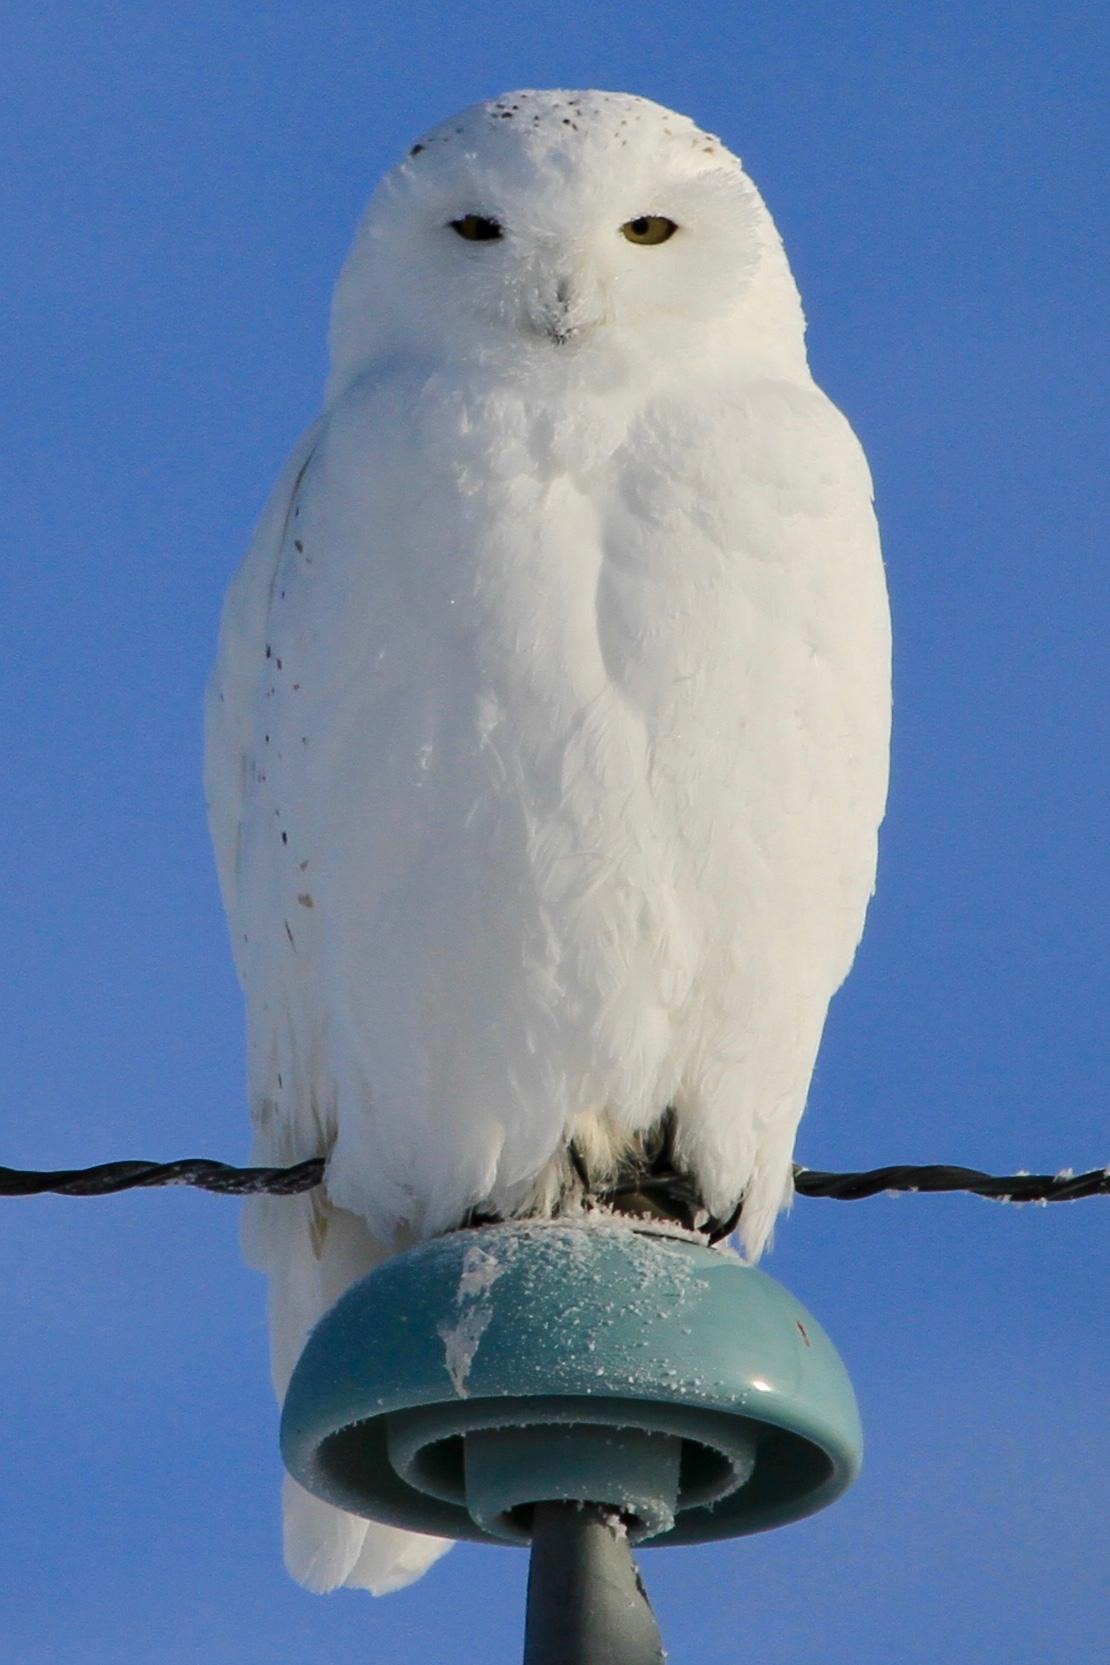 Hedwig aka Snowy Owl ( Bubo scandiacus ) in Camrose, Alberta/Treaty 6 territory. Photo by Anelyse.